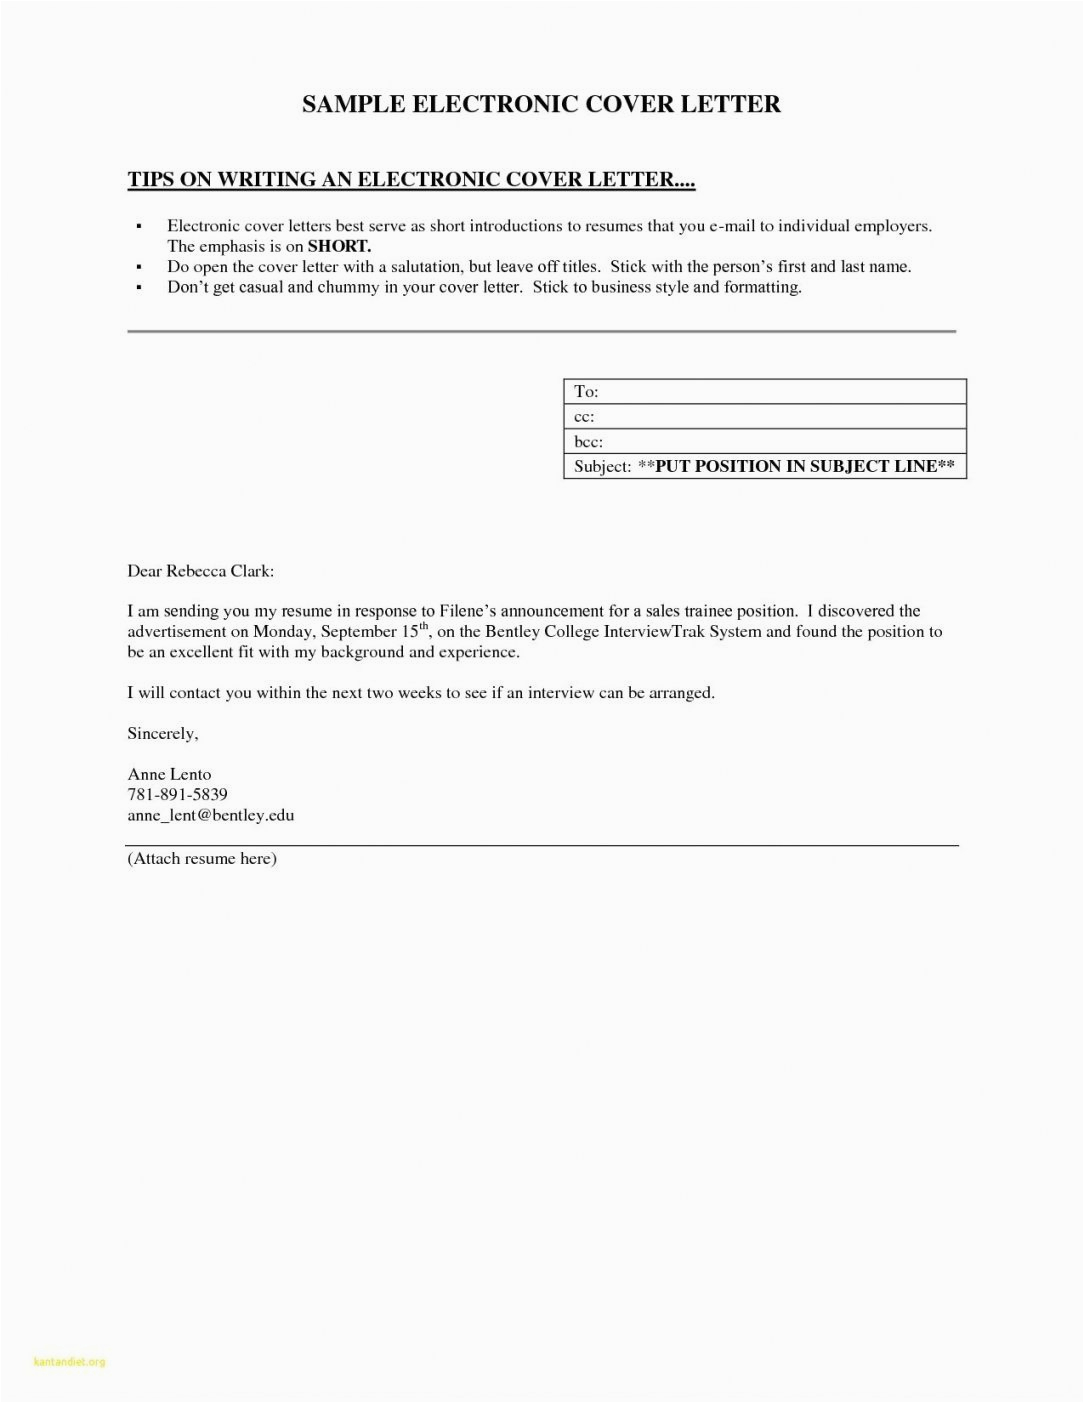 resume sample email for job application